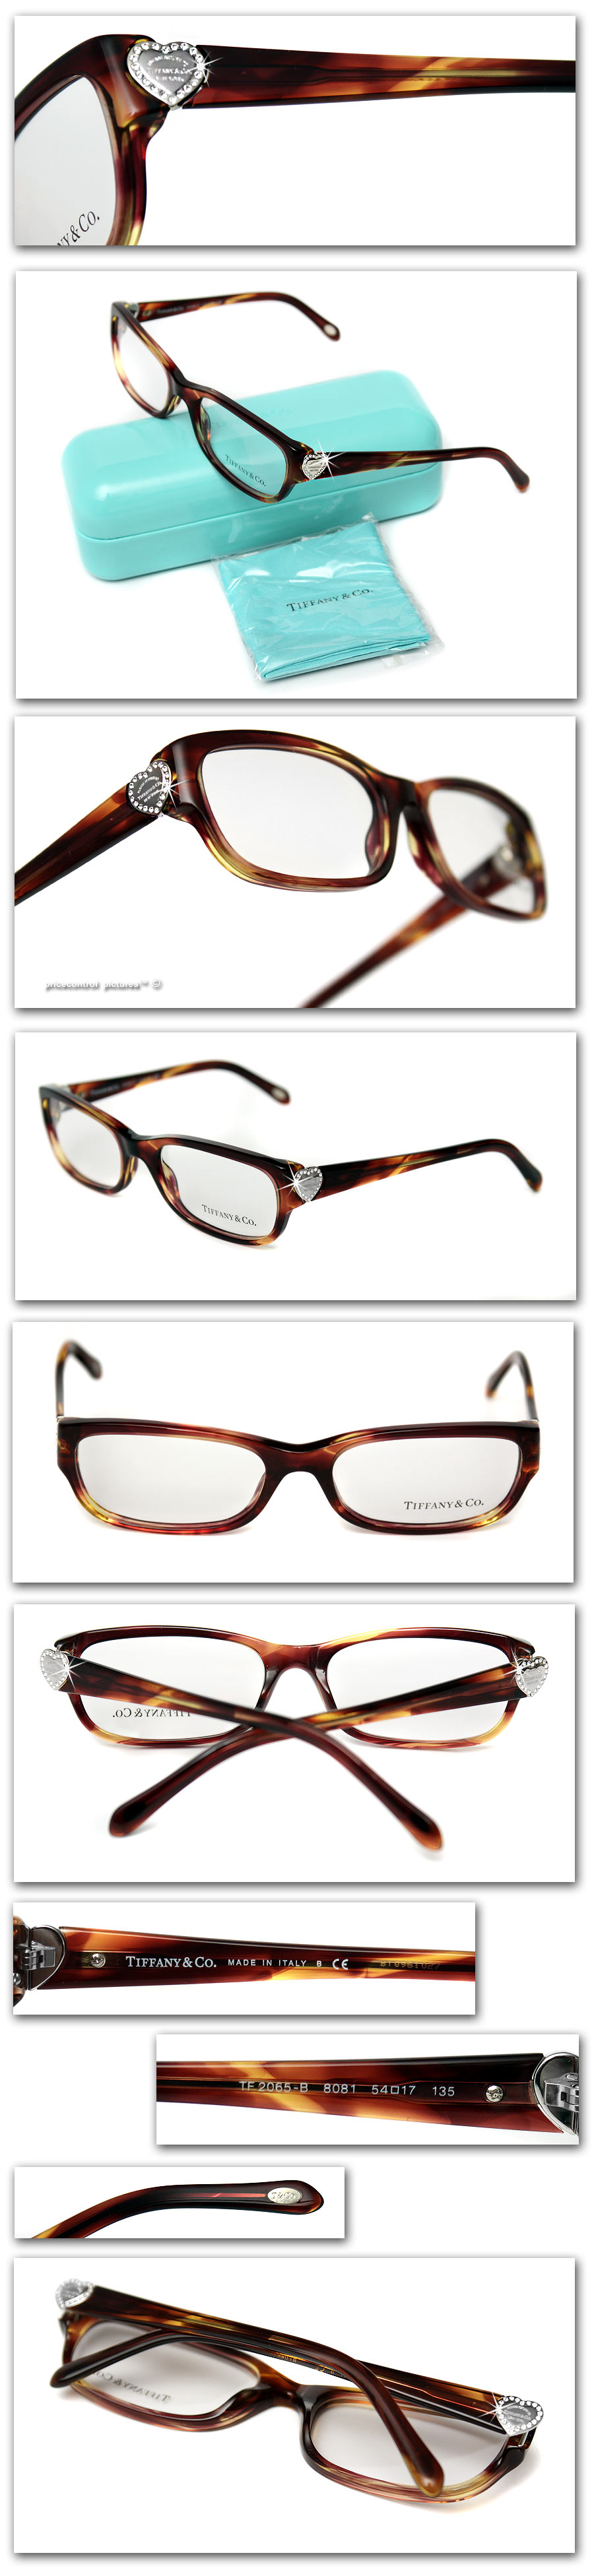 Tiffany Eyeglass Frames With Crystals : USD490 TIFFANY & Co. Ladies DIAMOND CRYSTAL HEART GLASSES eBay